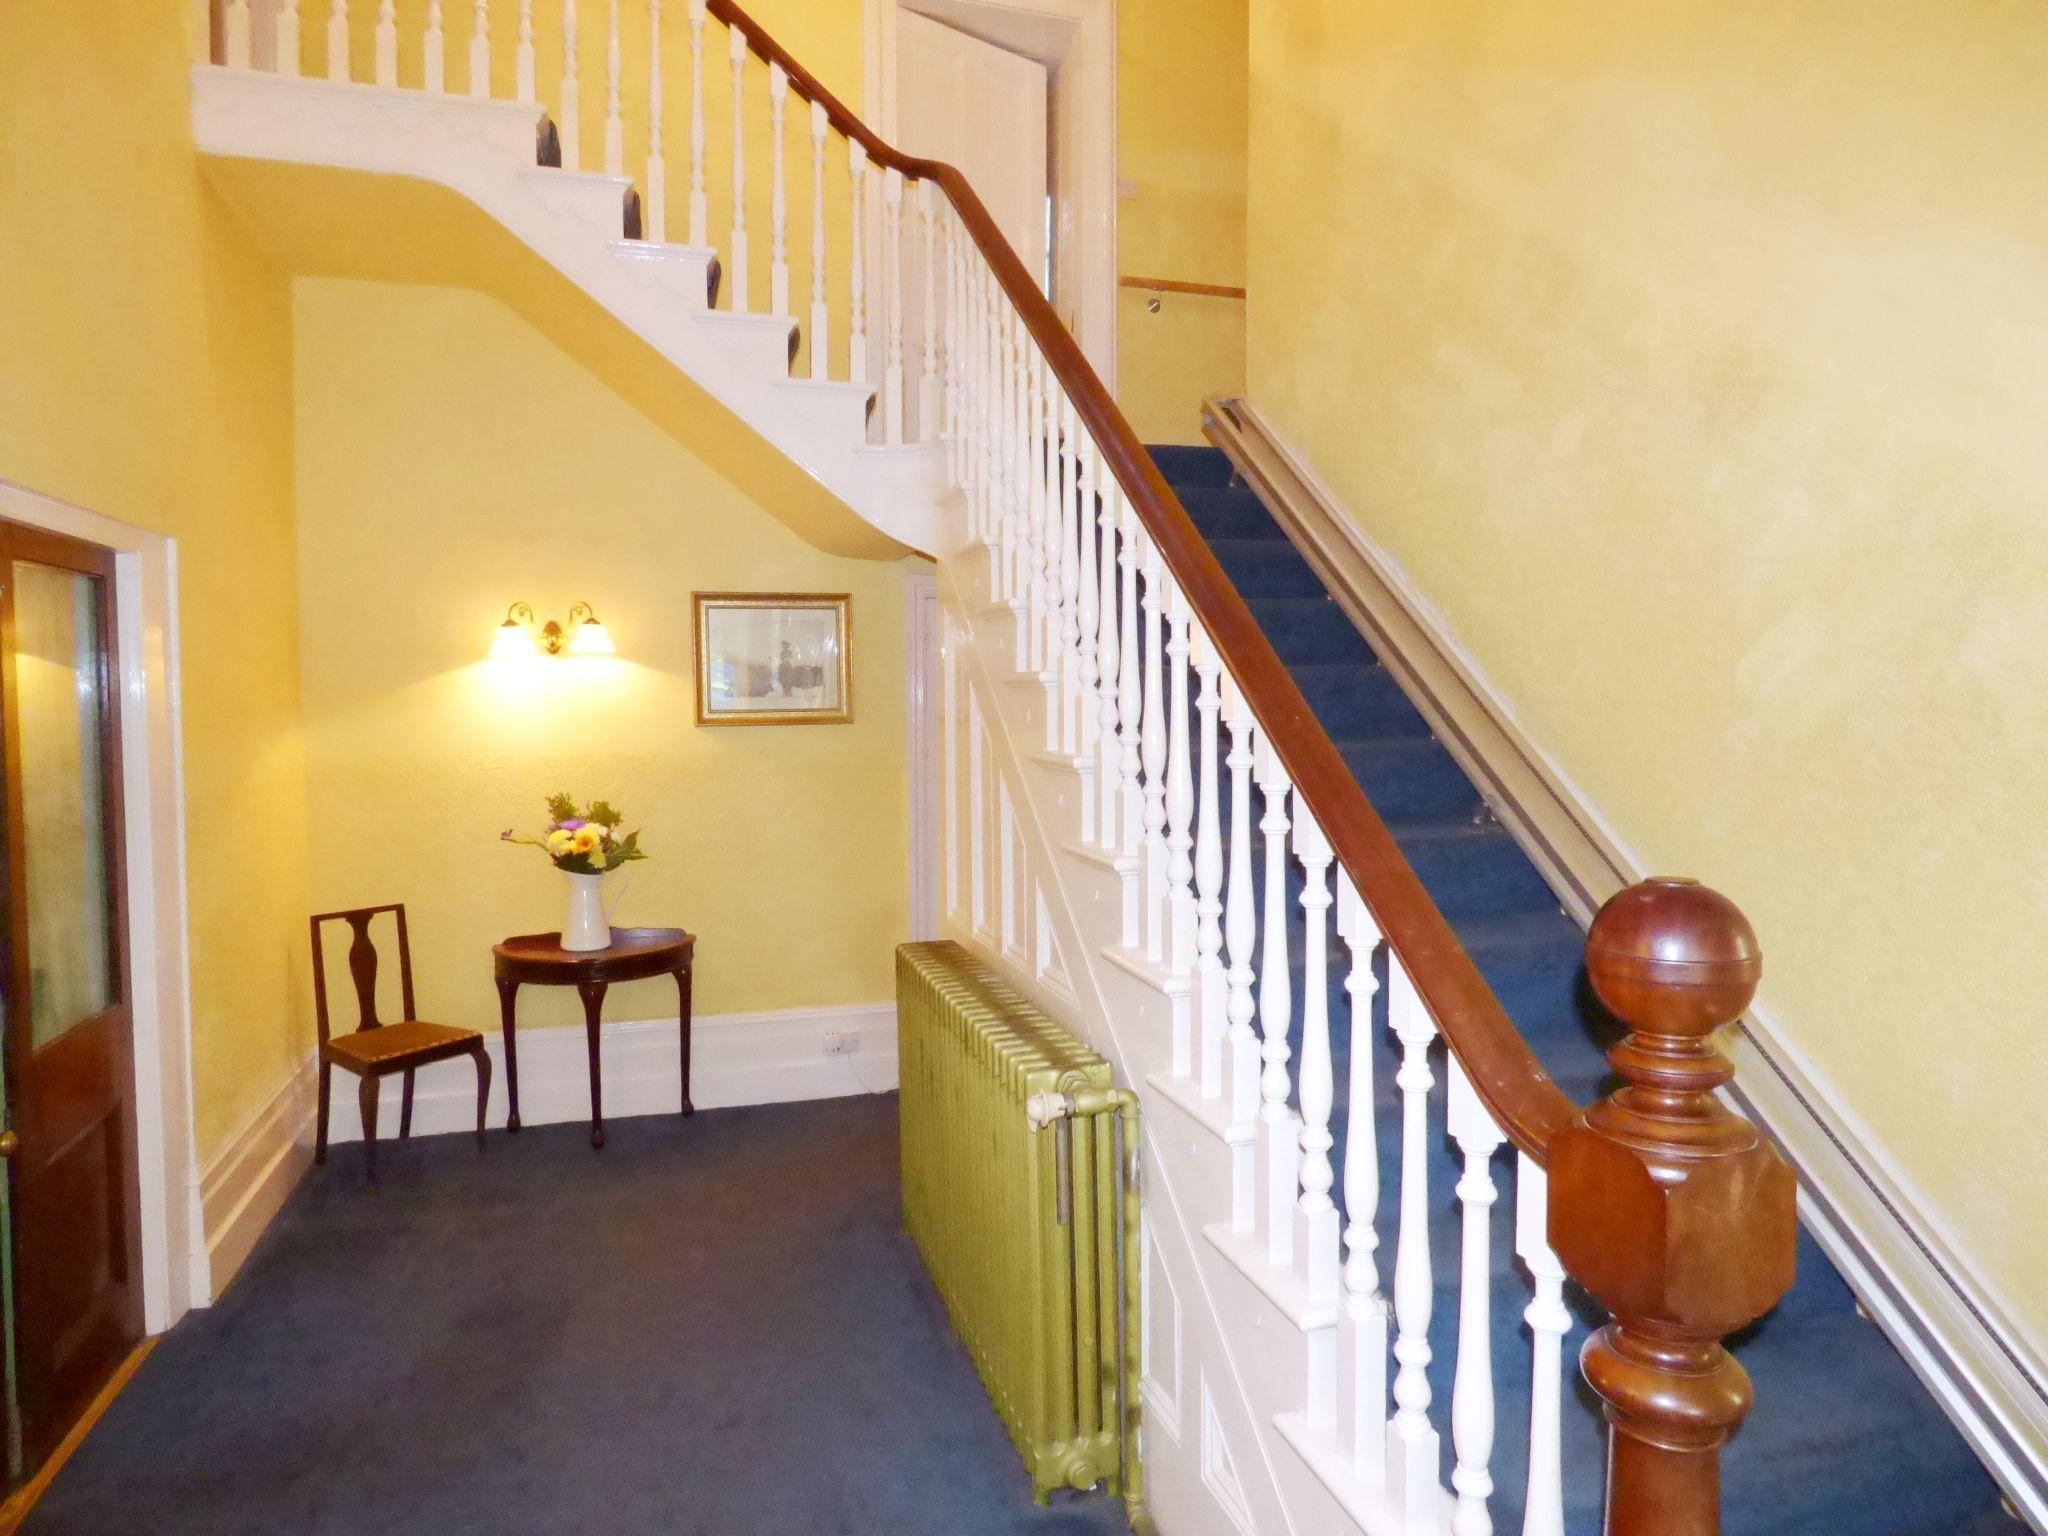 6 Bedroom Detached House For Sale - Reception Hall